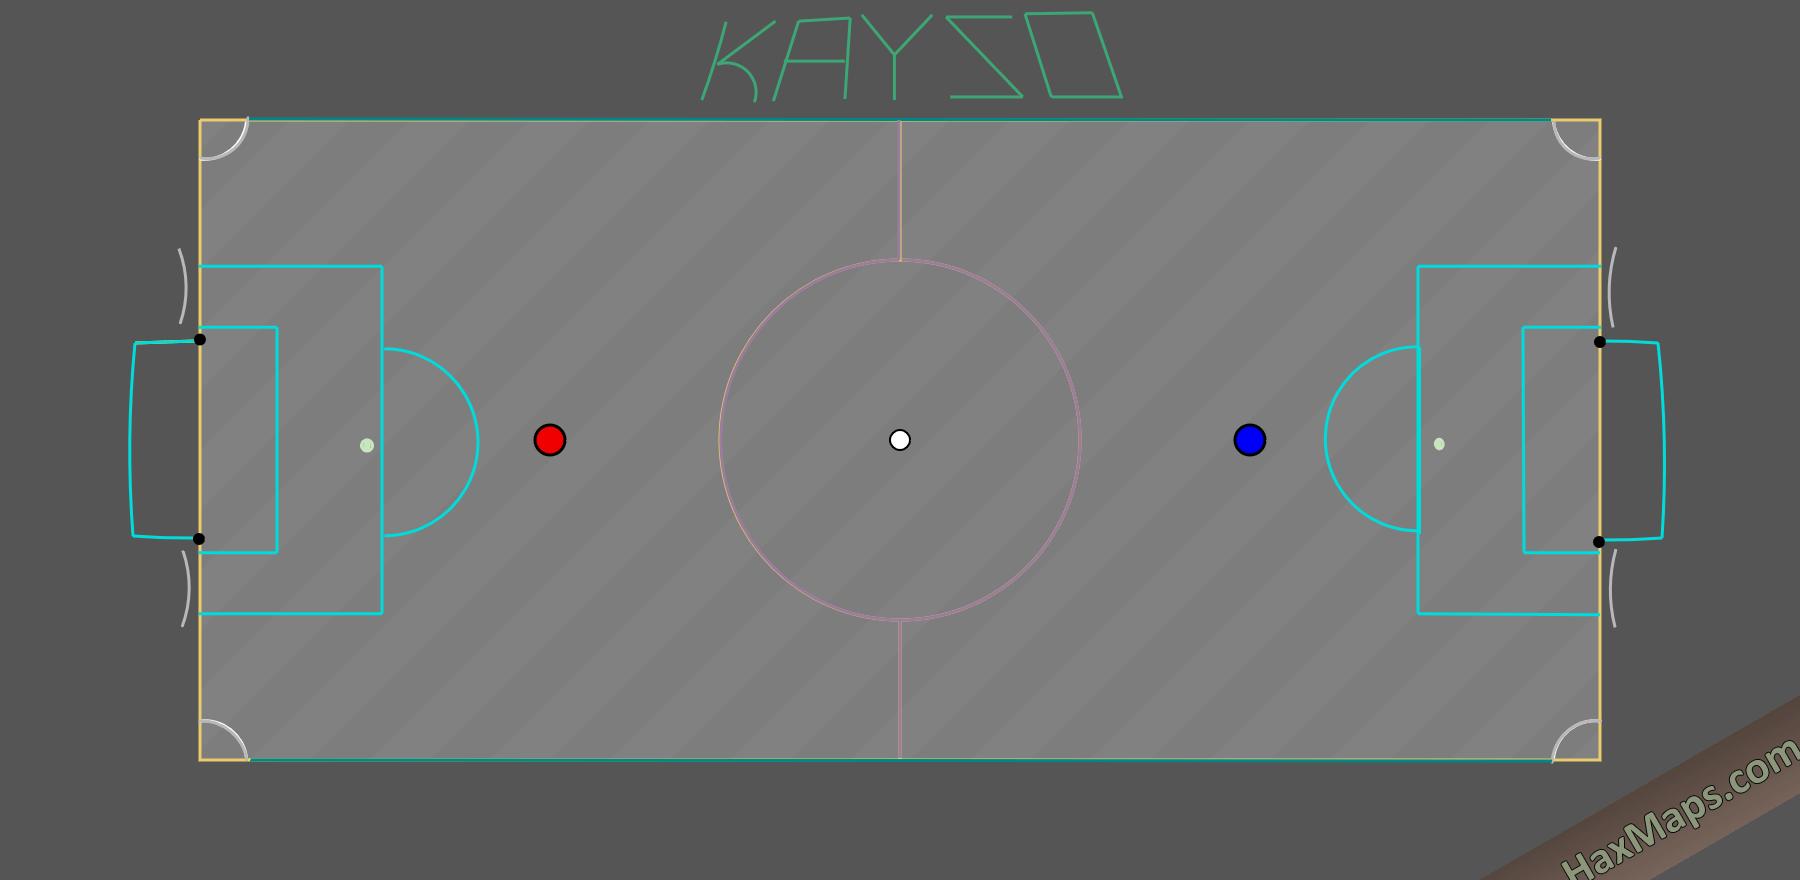 hax ball maps   Kayzo Mini Real Soccer v3